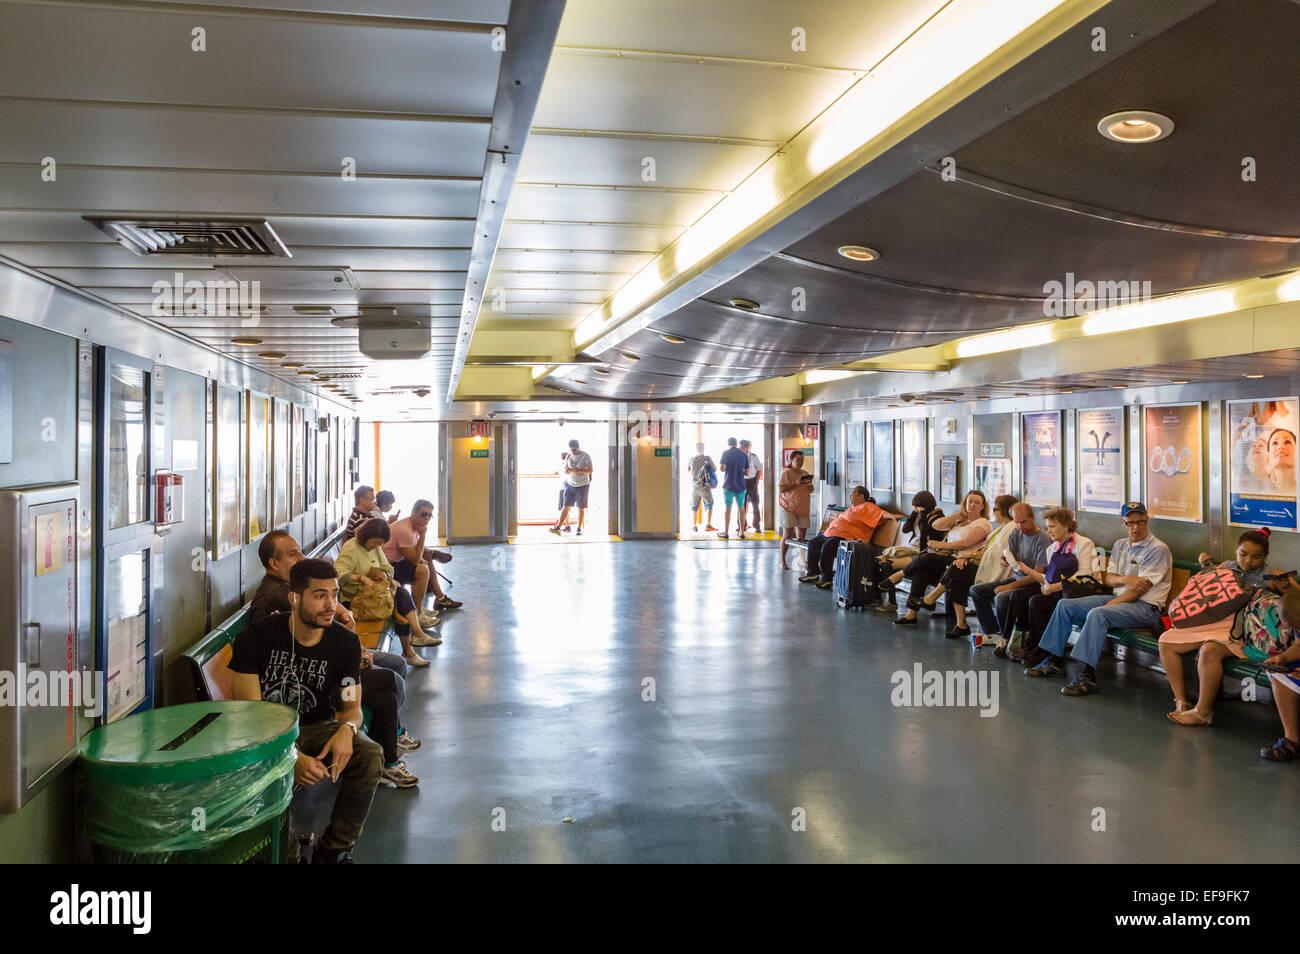 Passengers on board the Staten Island Ferry, New York City, NY, USA - Stock Image